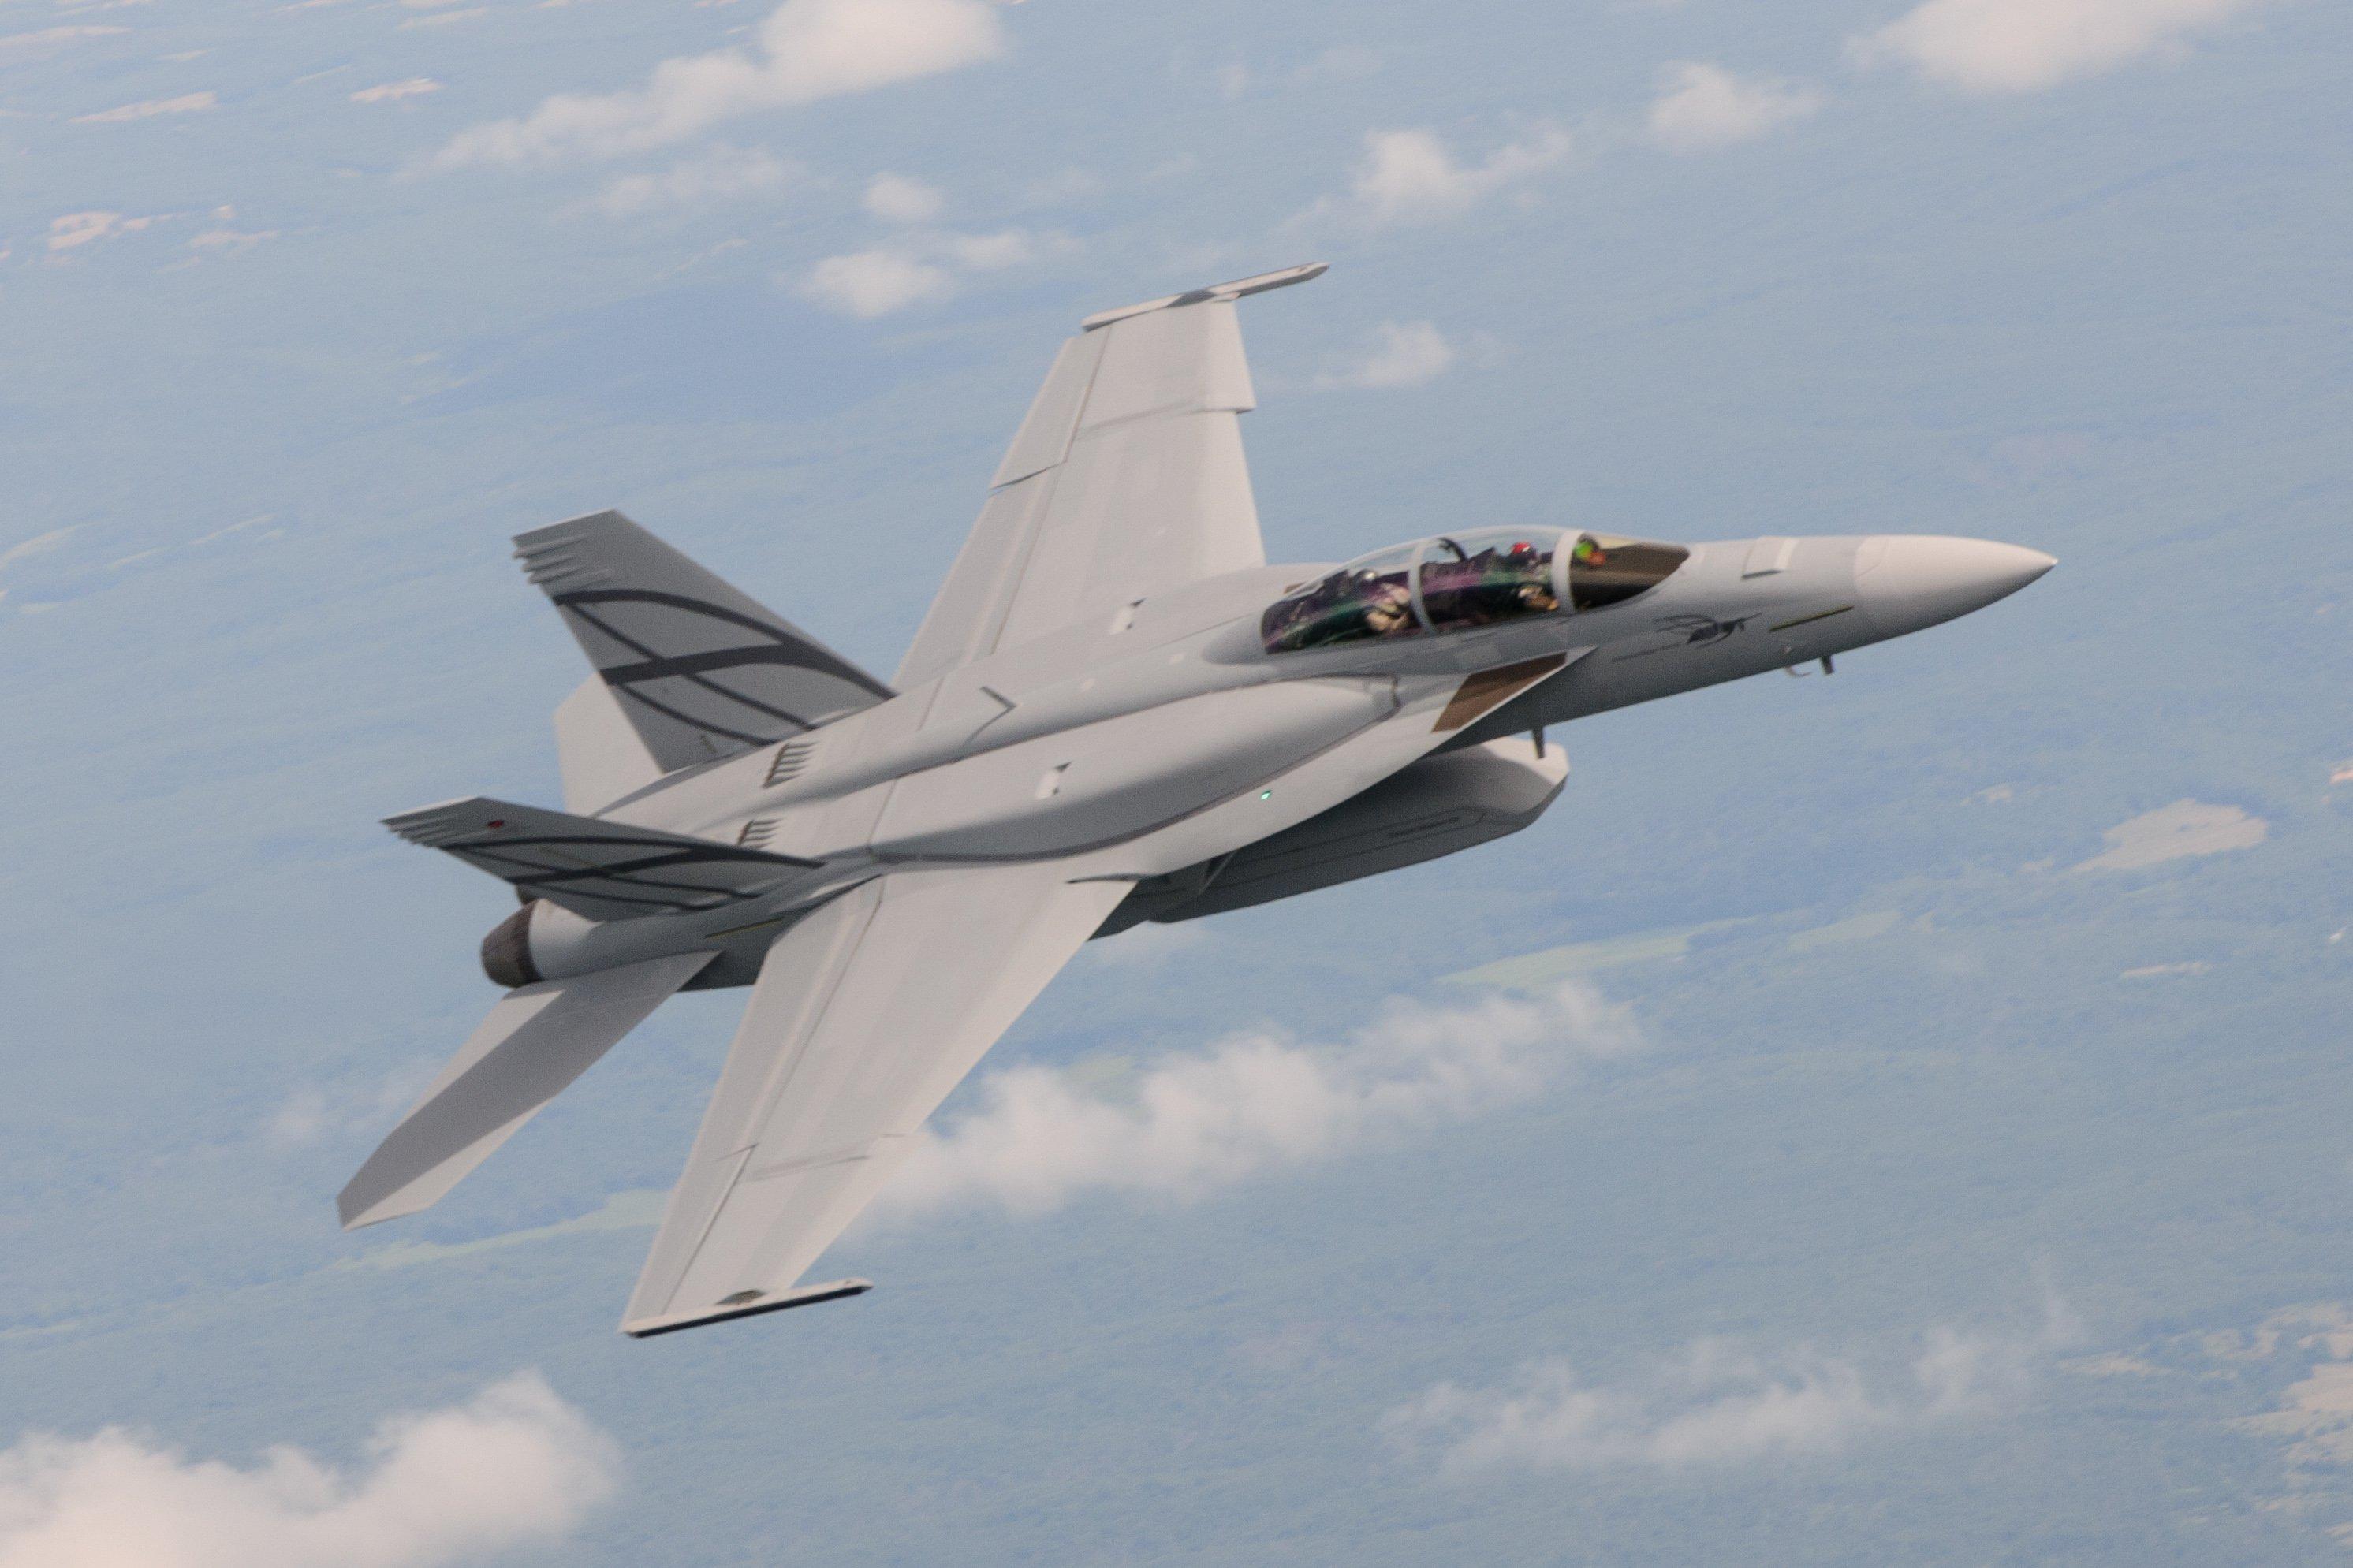 F 18 Advanced Super Hornet Advanced Super Hornet with